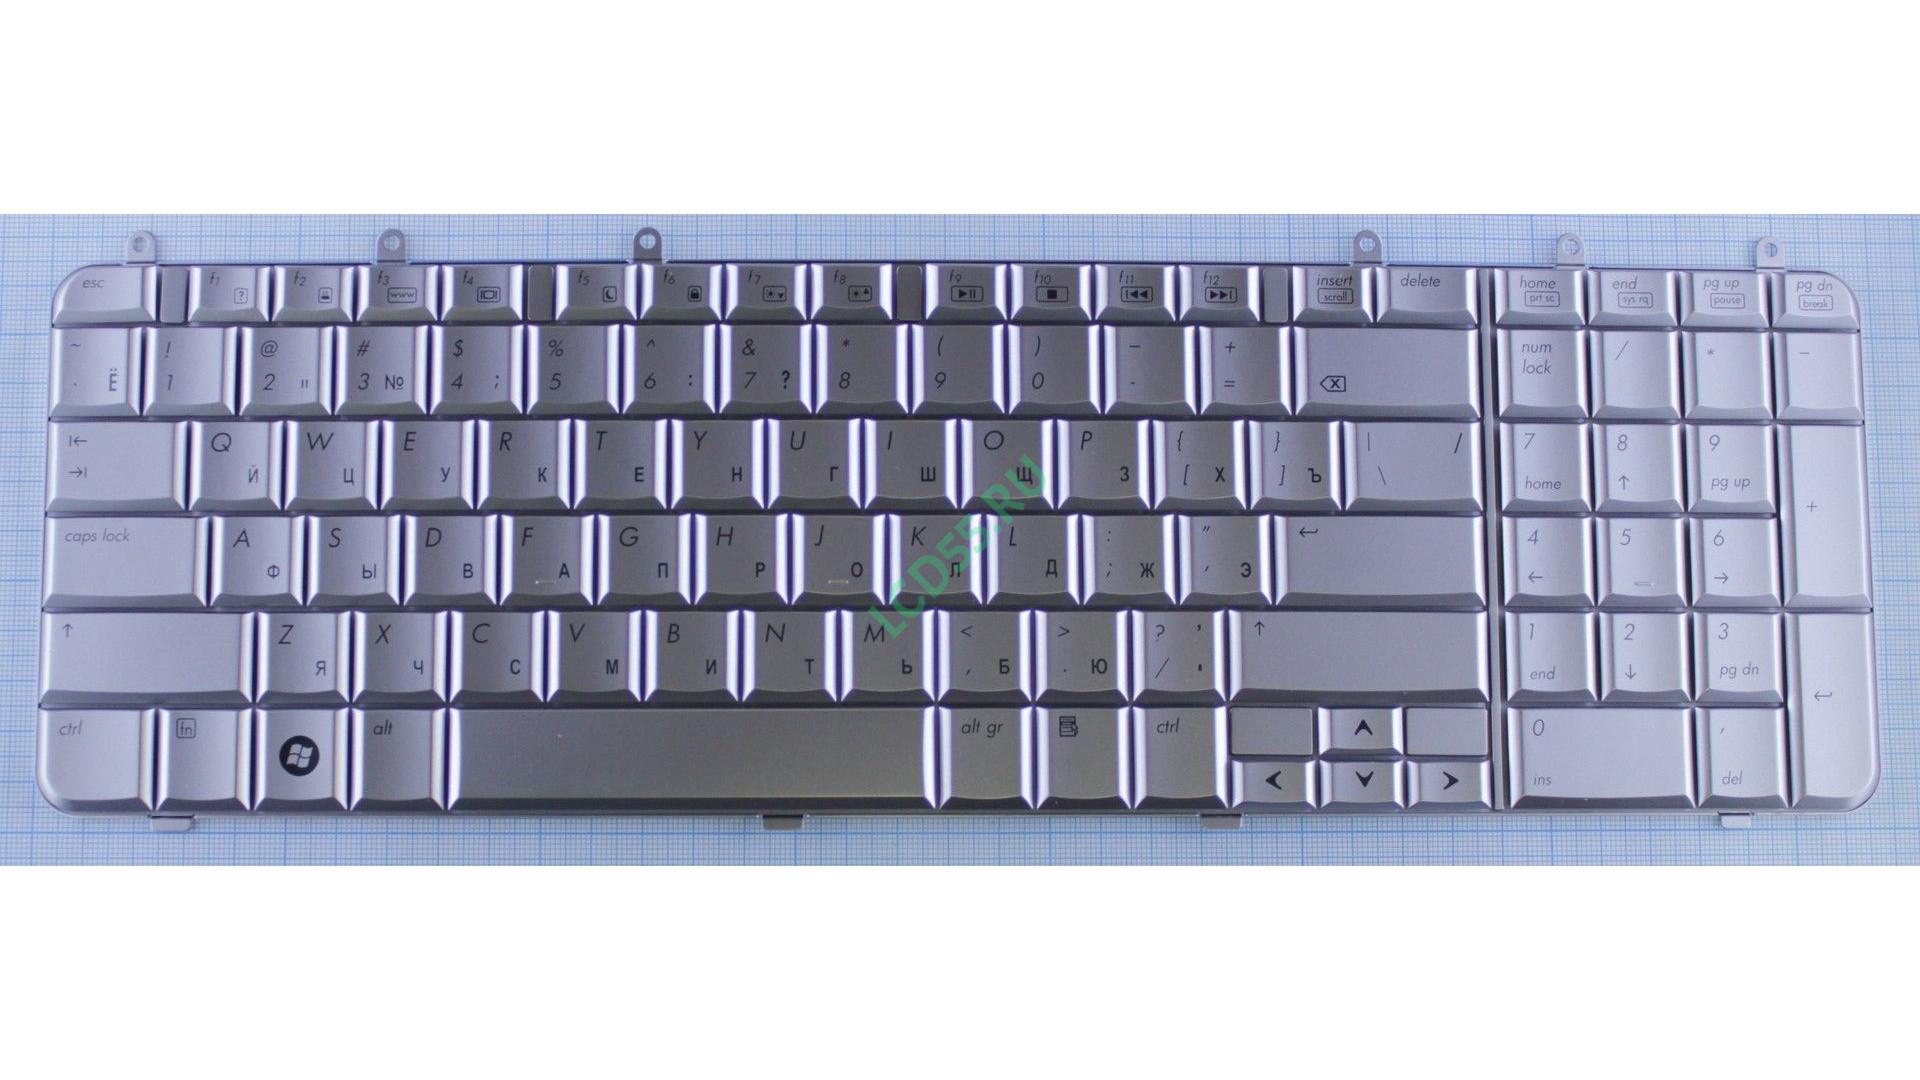 Клавиатура HP Pavilion DV7-1000